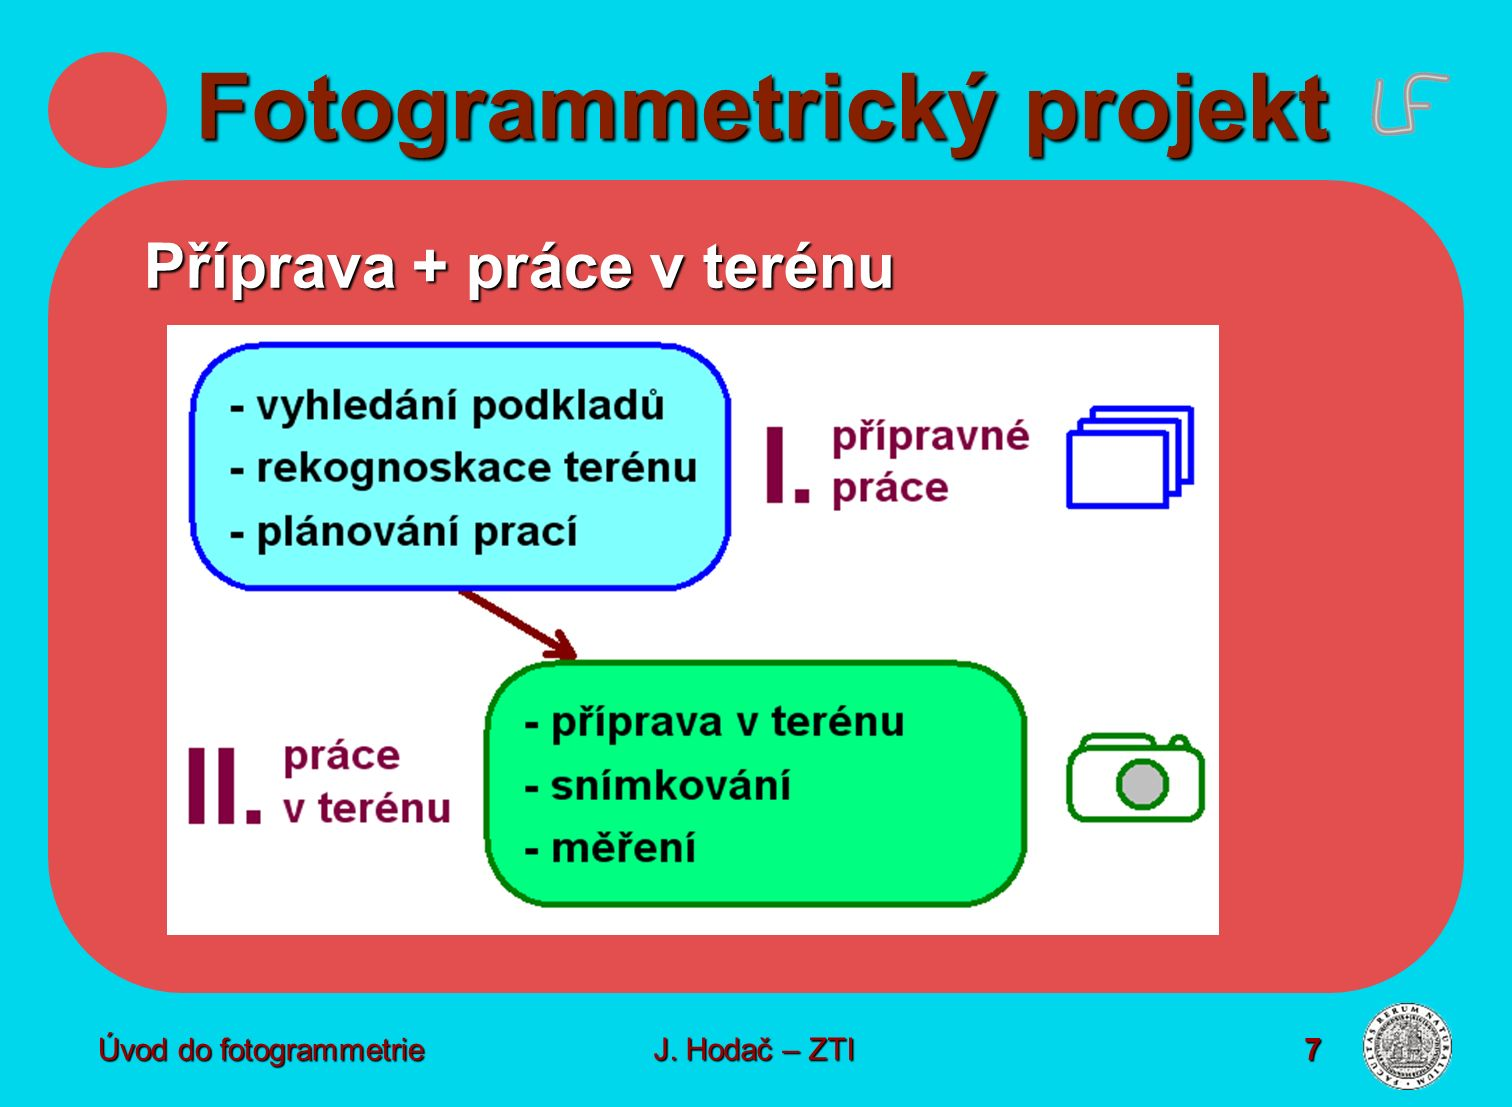 Fotogrammetrický projekt